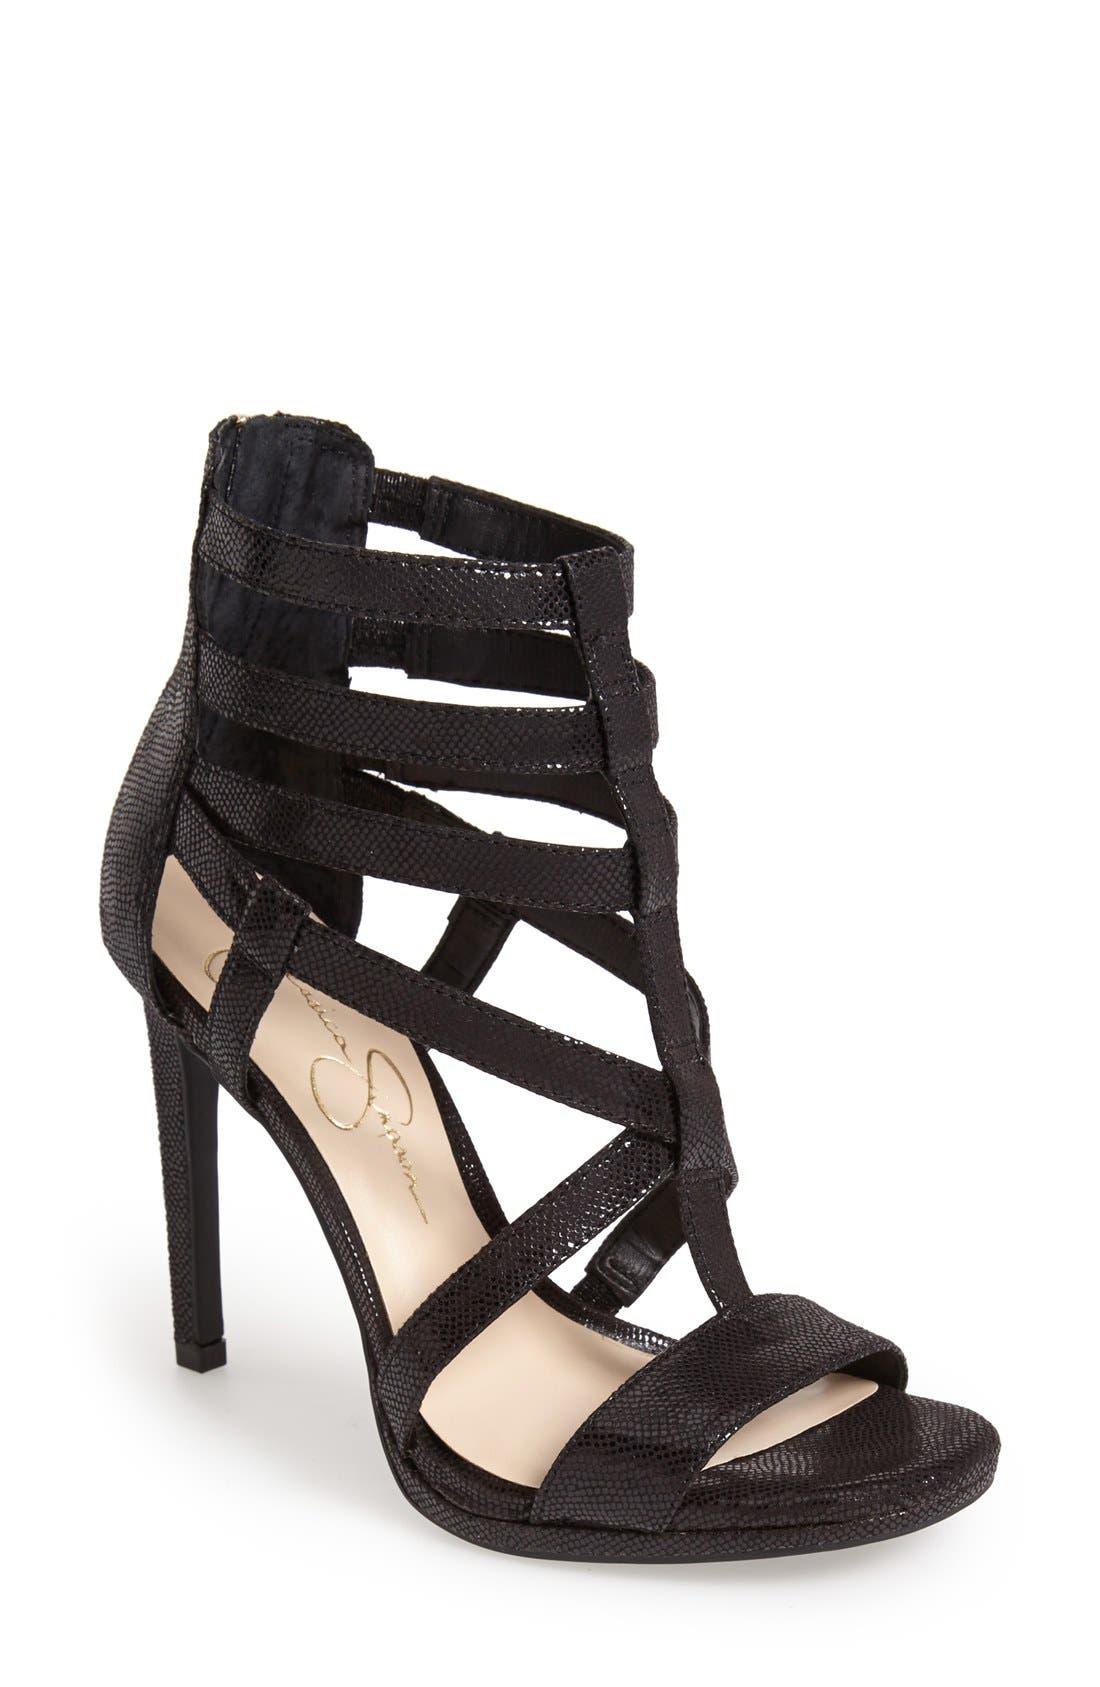 'Marthena' Sandal, Main, color, 001